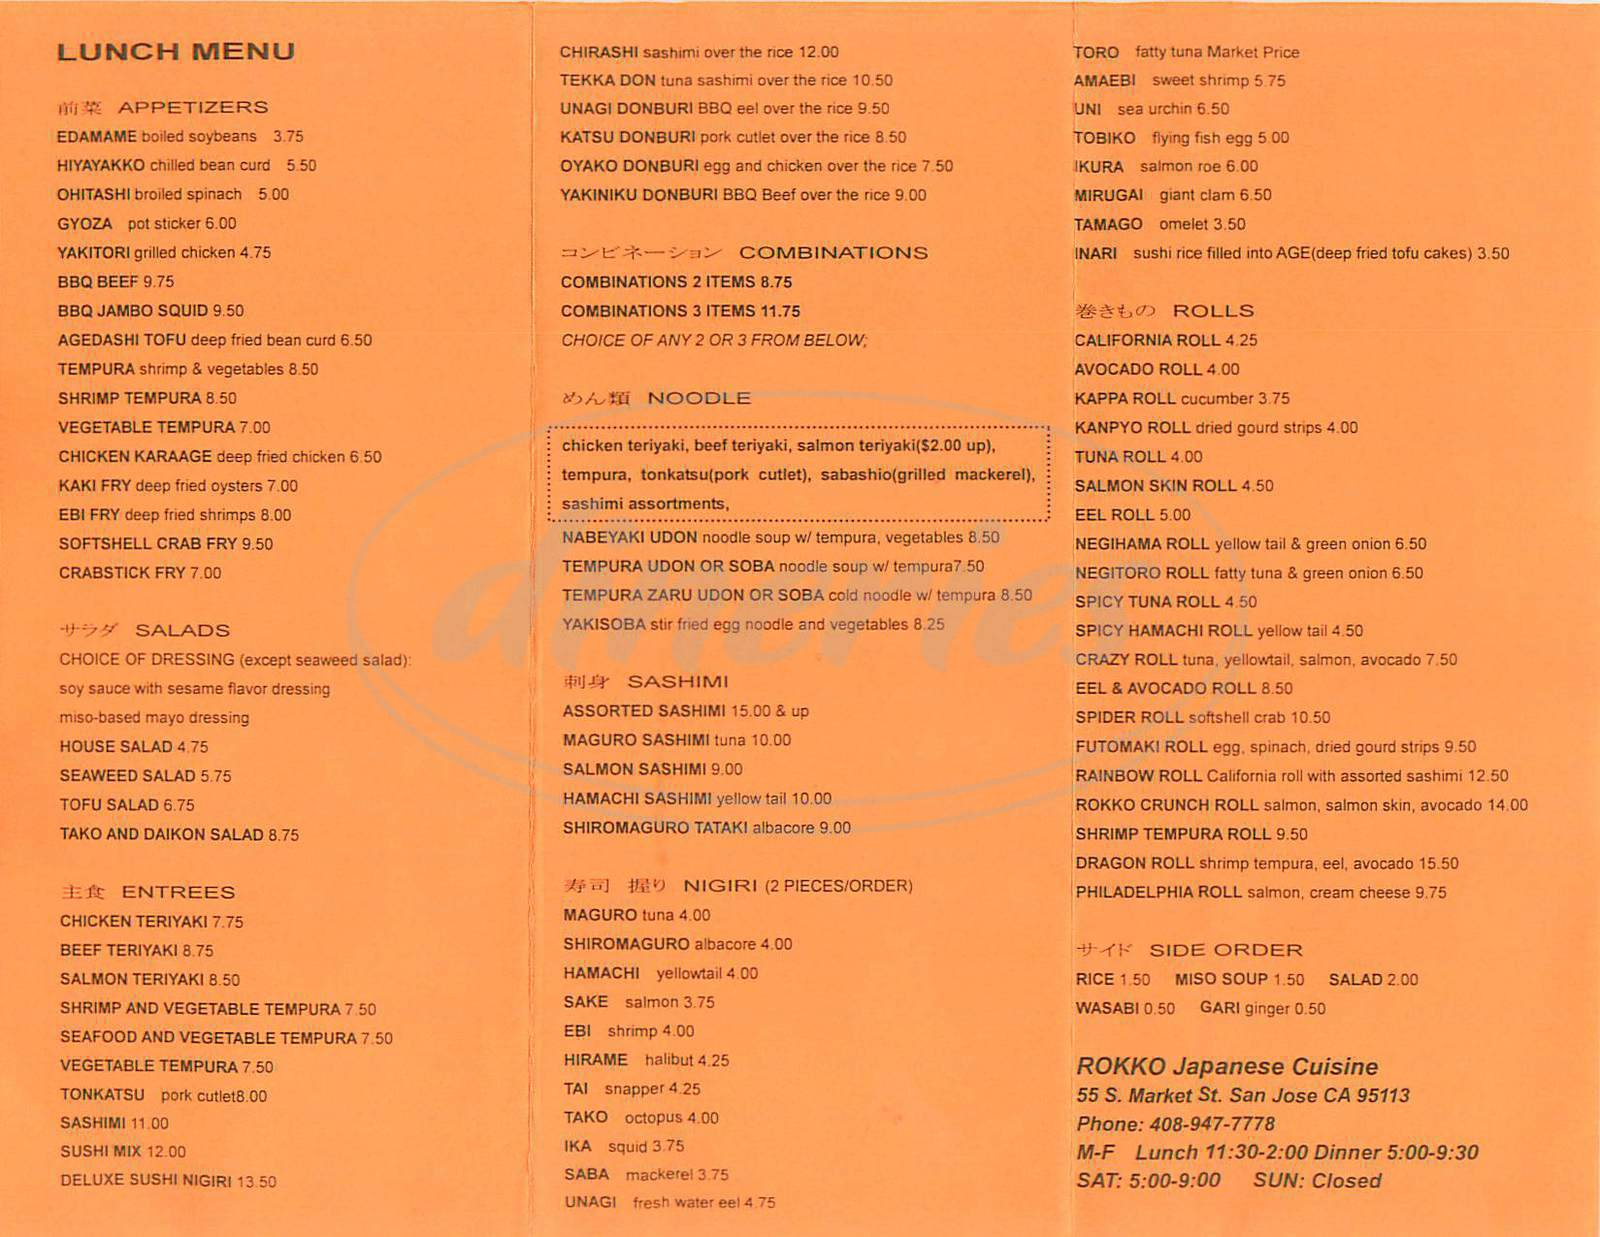 menu for Rokko Japanese Cuisine